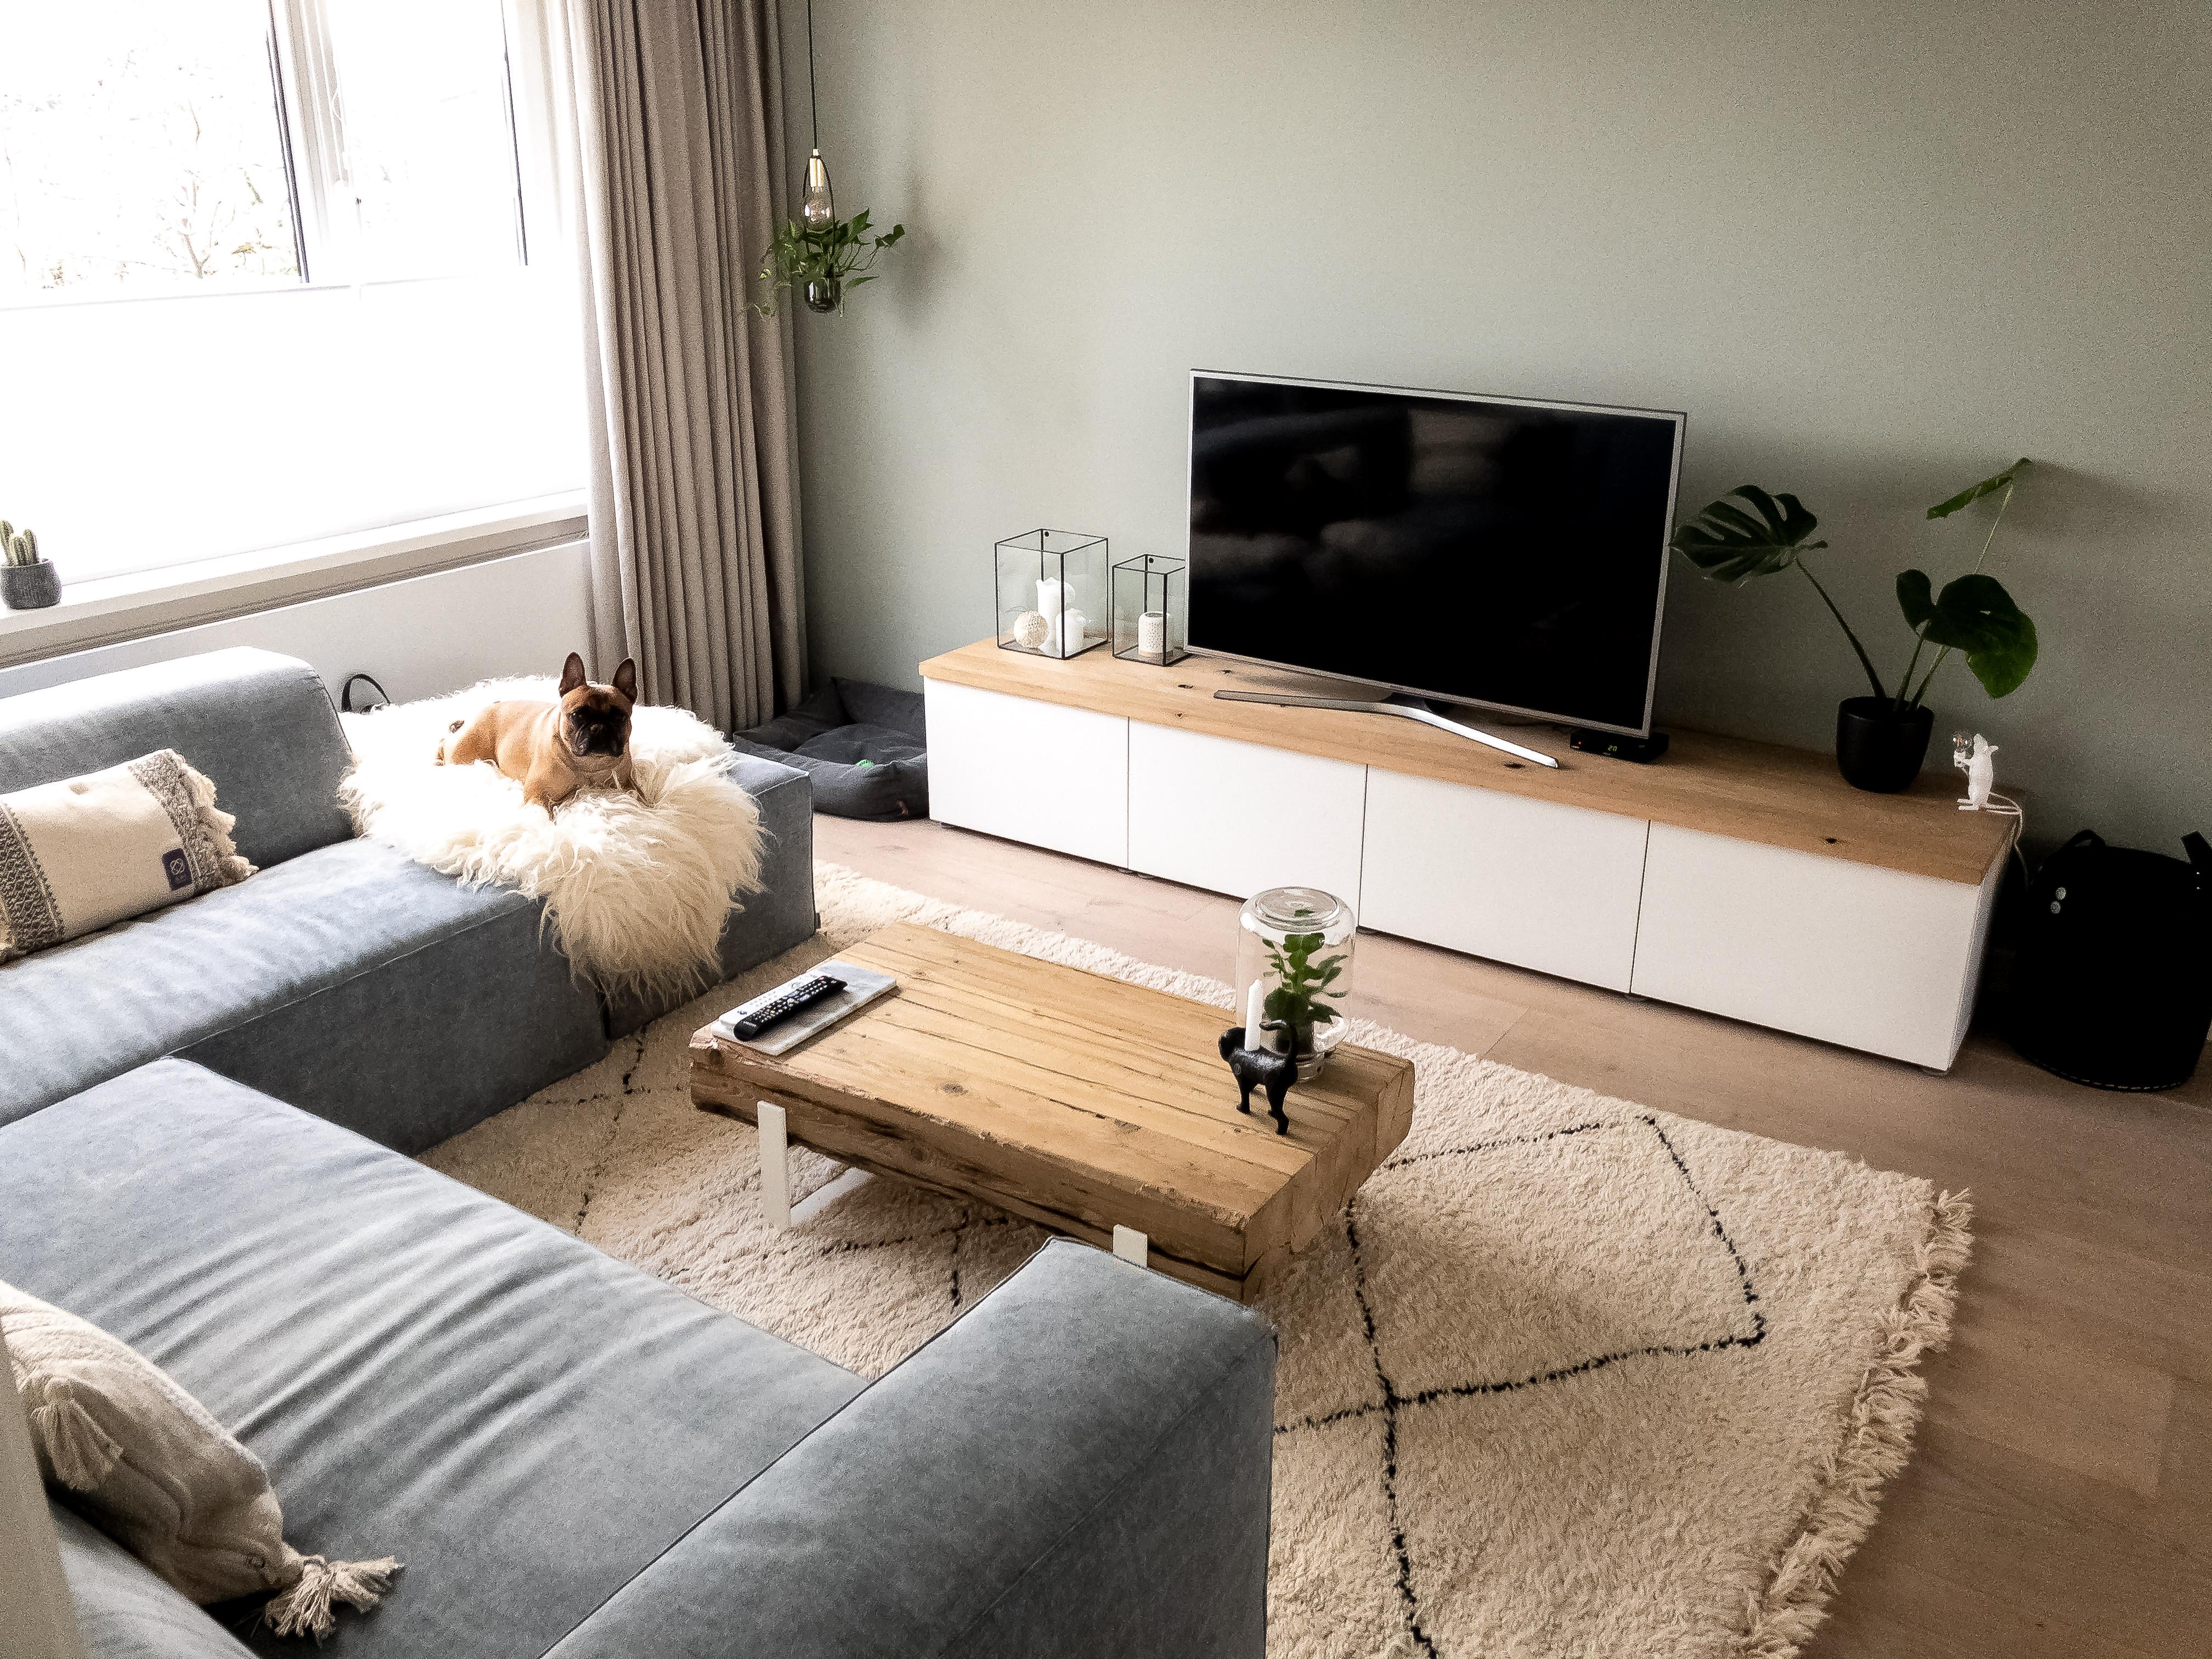 woonkamer neutrale kleuren met bohemian deatails